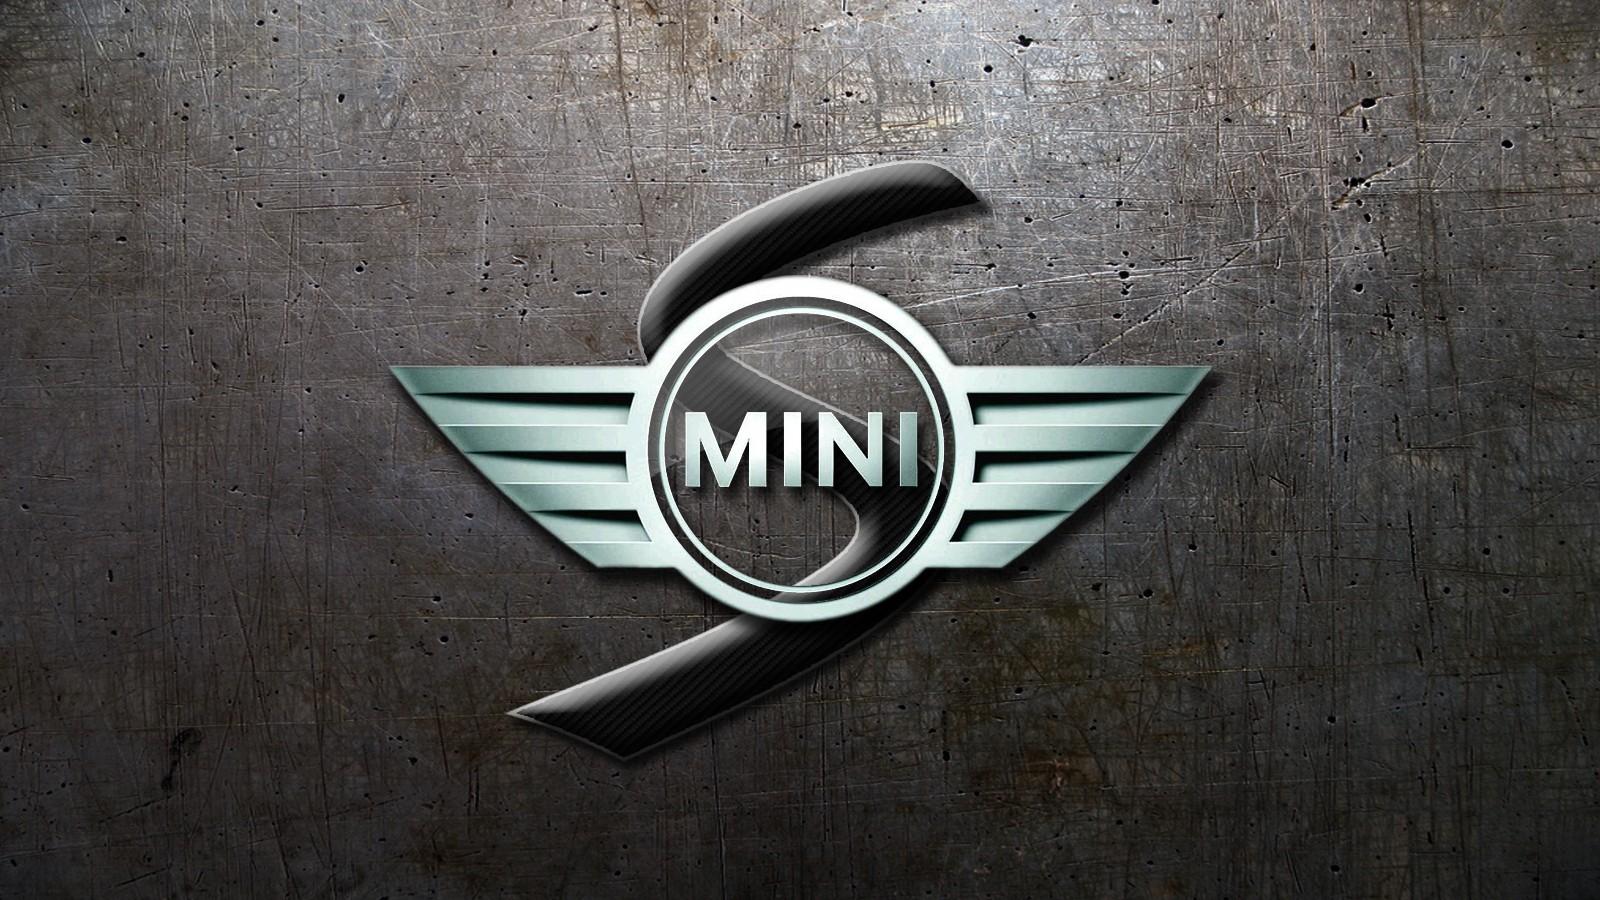 mini cooper hd wallpaper